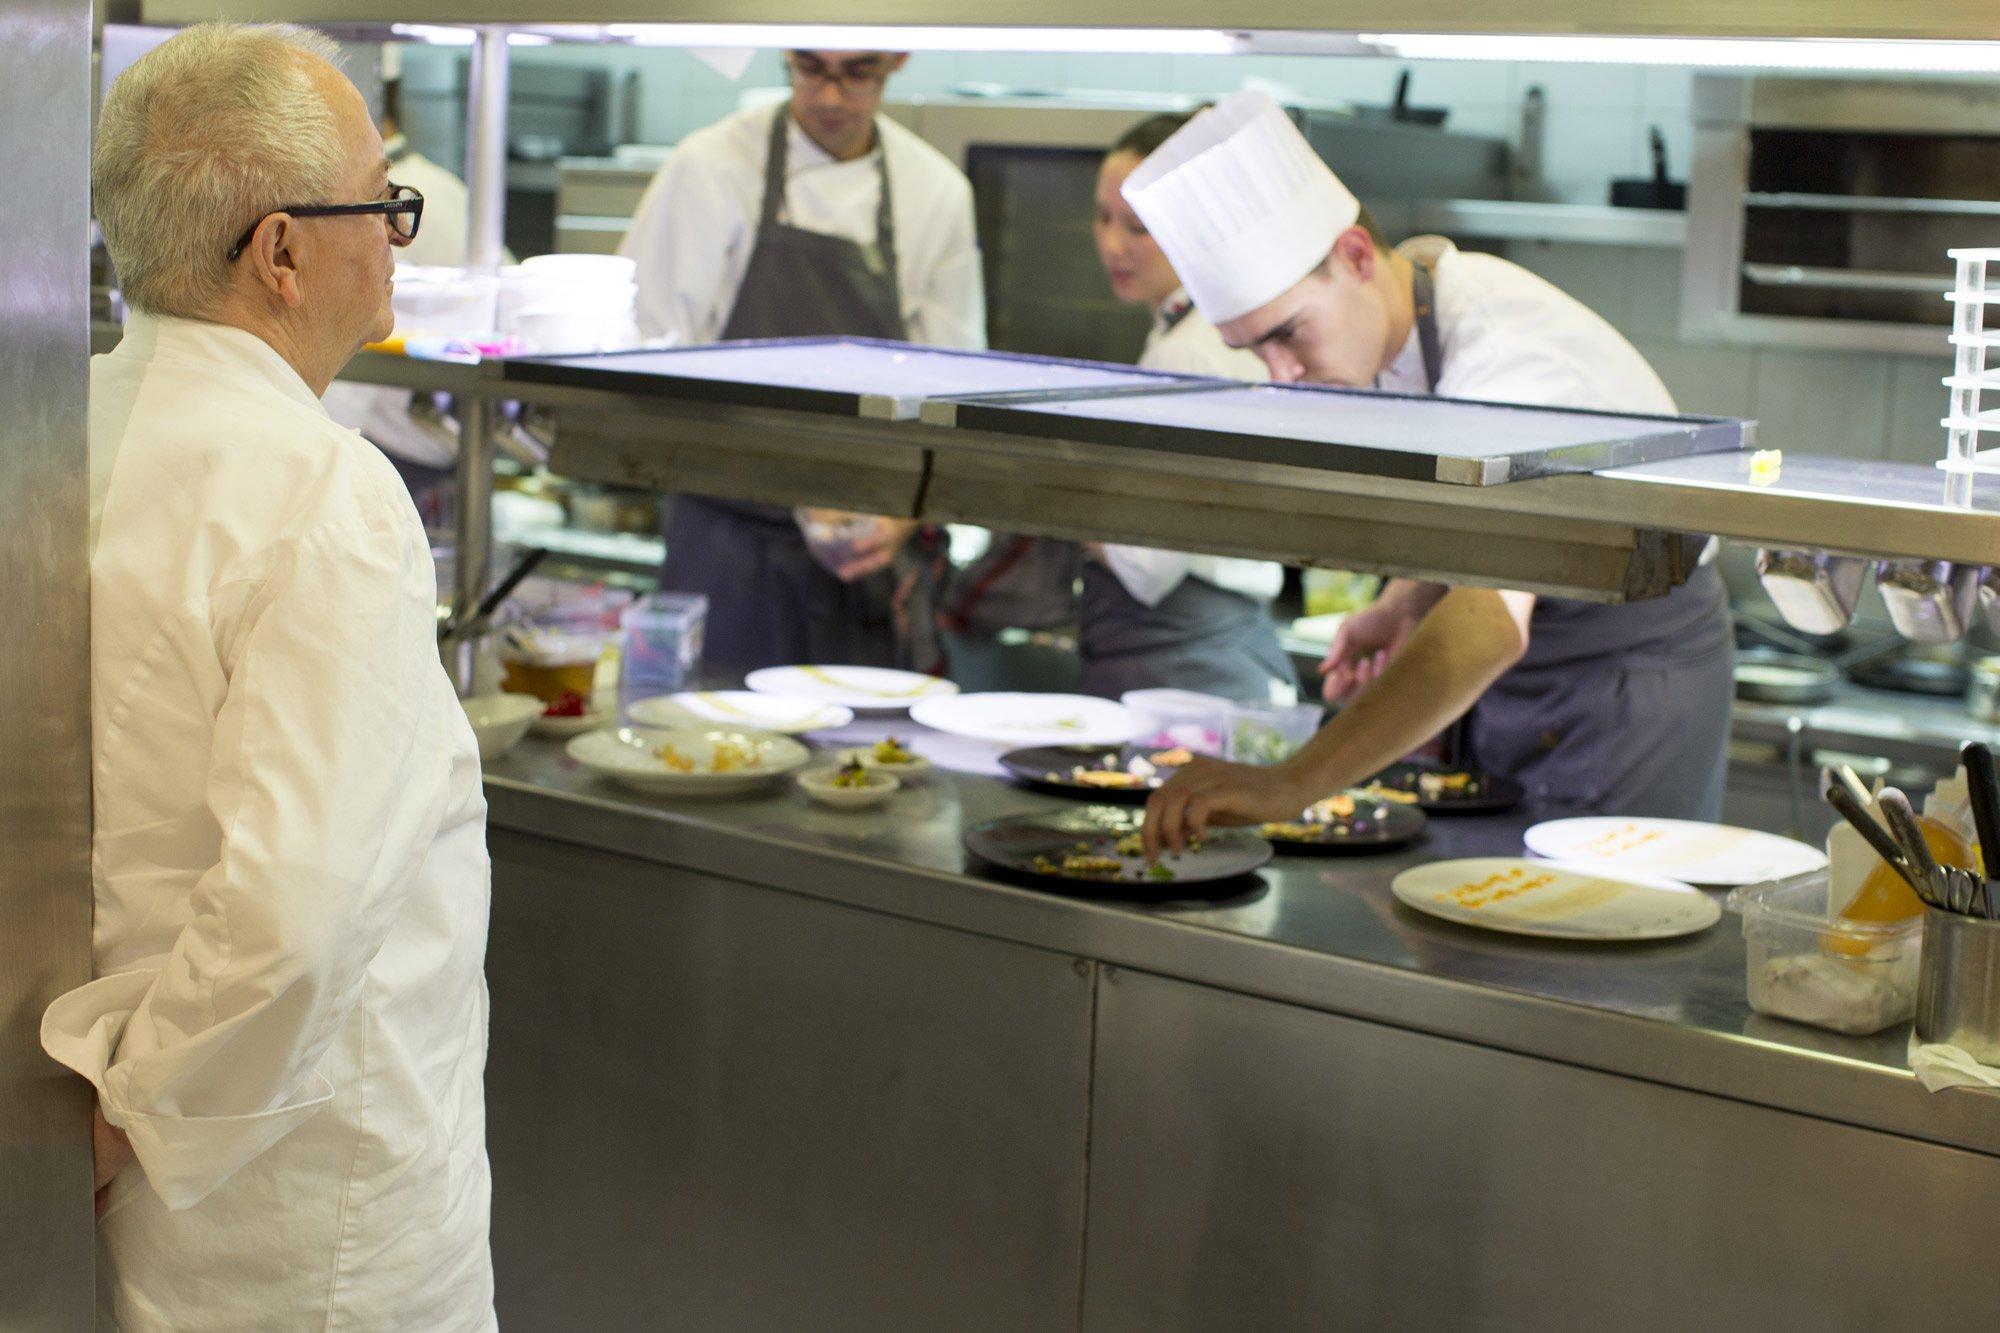 Chefs at the Arzak restraurant prepare dishes as Juan Mari Arzak watches over © Uxío Da Vila